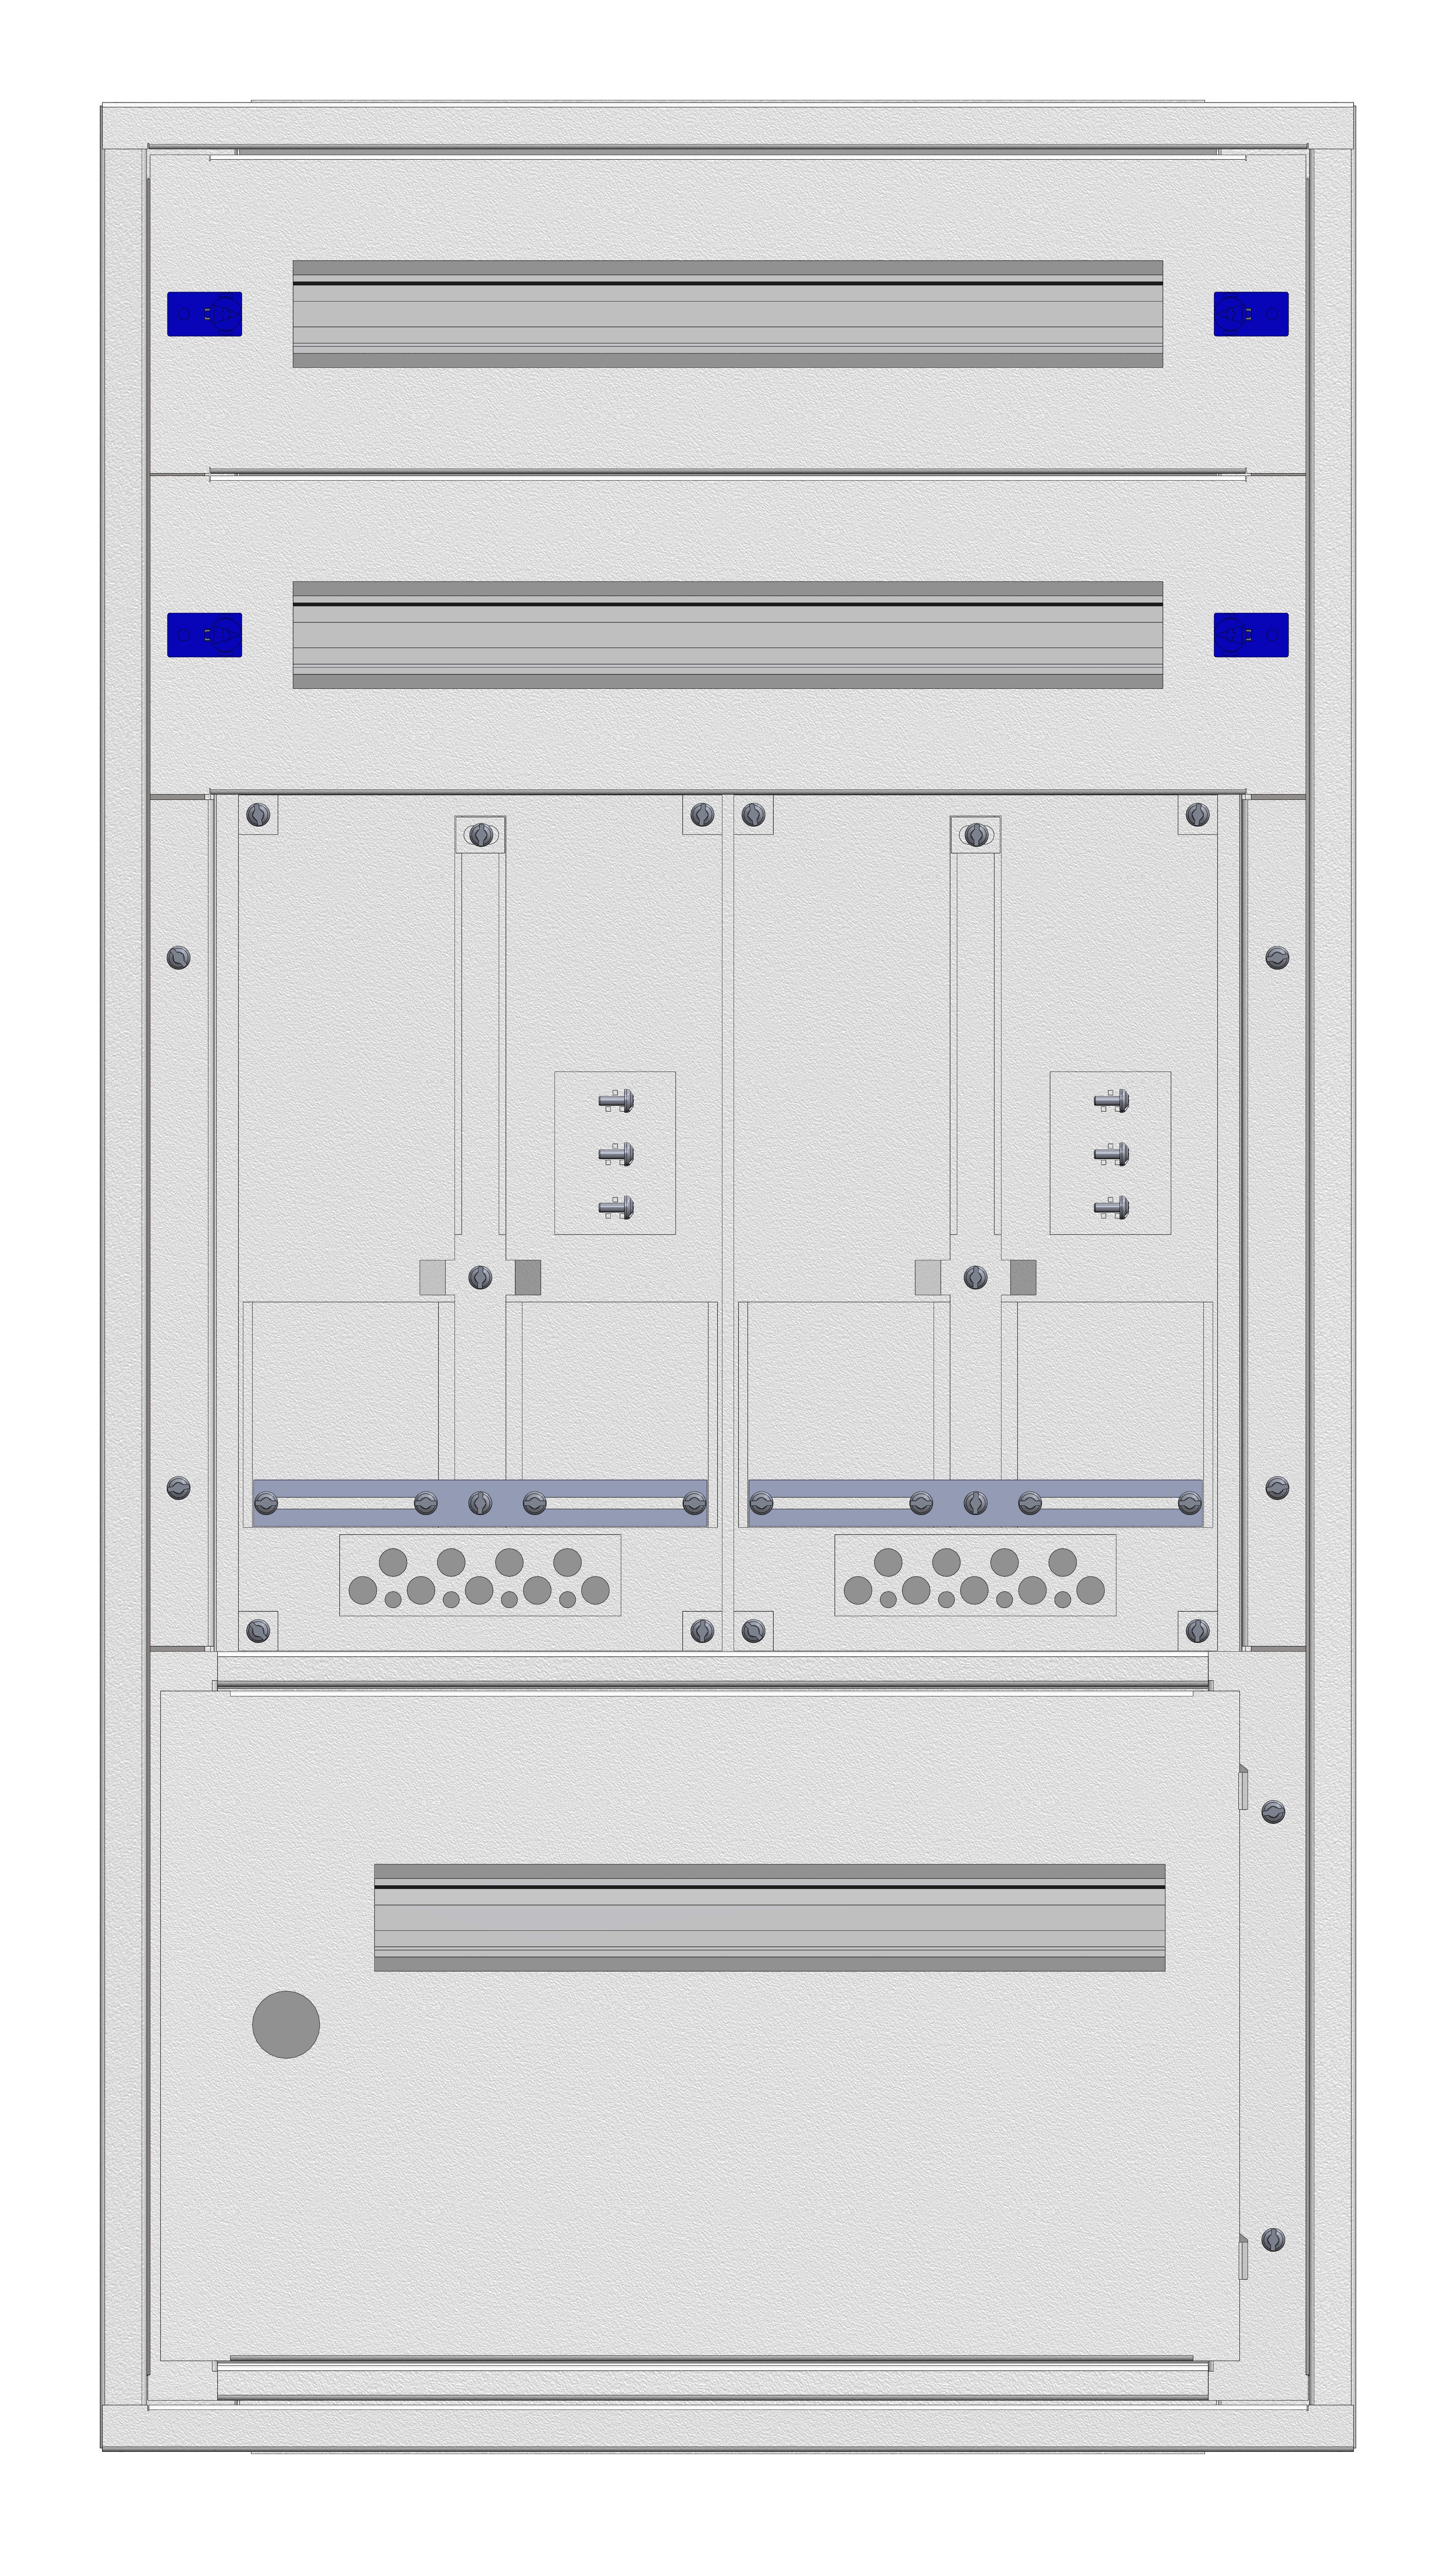 1 Stk Aufputz-Zählerverteiler 2A-21E/STMK 2ZP, H1055B590T250mm IL160221GS